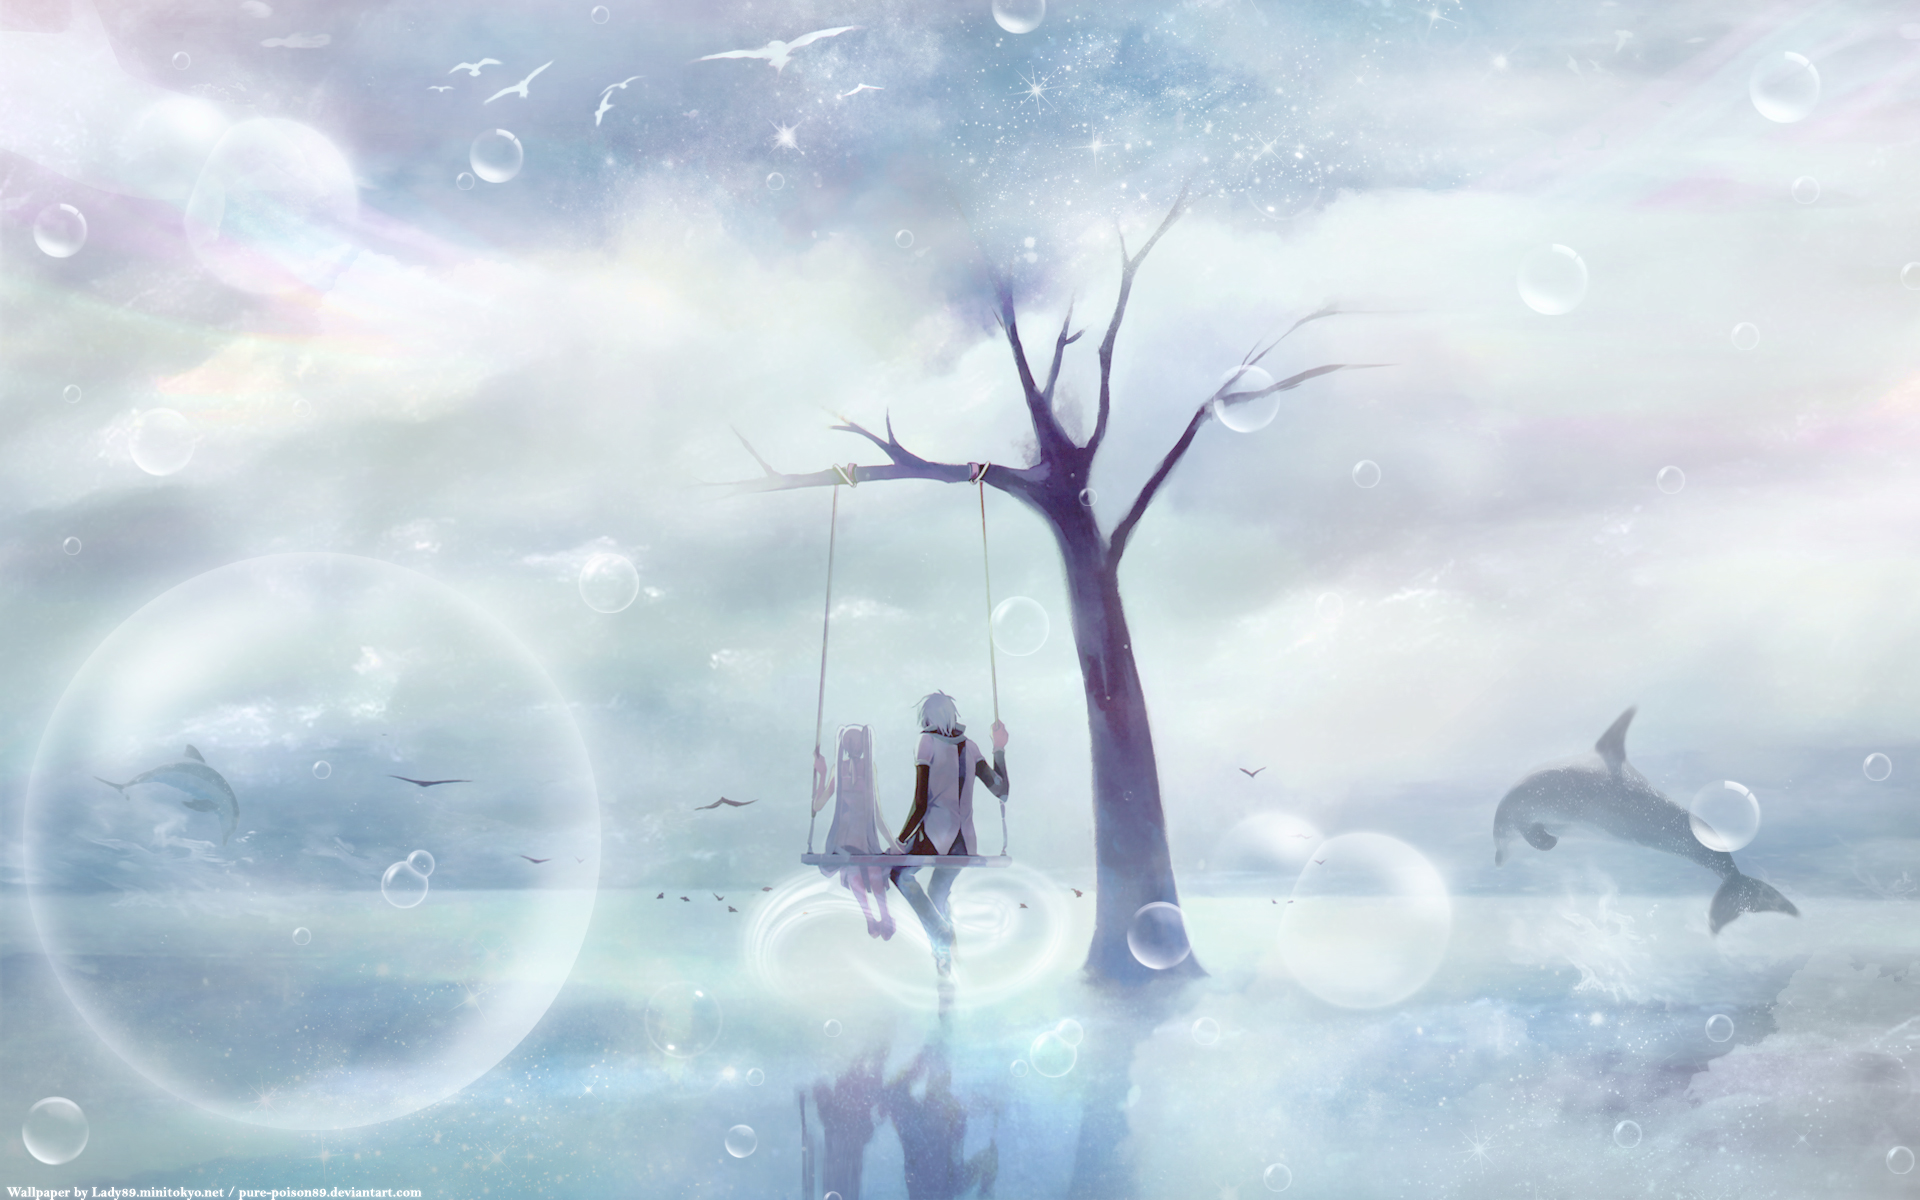 Anime - Vocaloid  - Hatsune Miku - Dolphin - Cloud - Hatsune - Miku - Kaito - Shion - Kaito Shion Papel de Parede